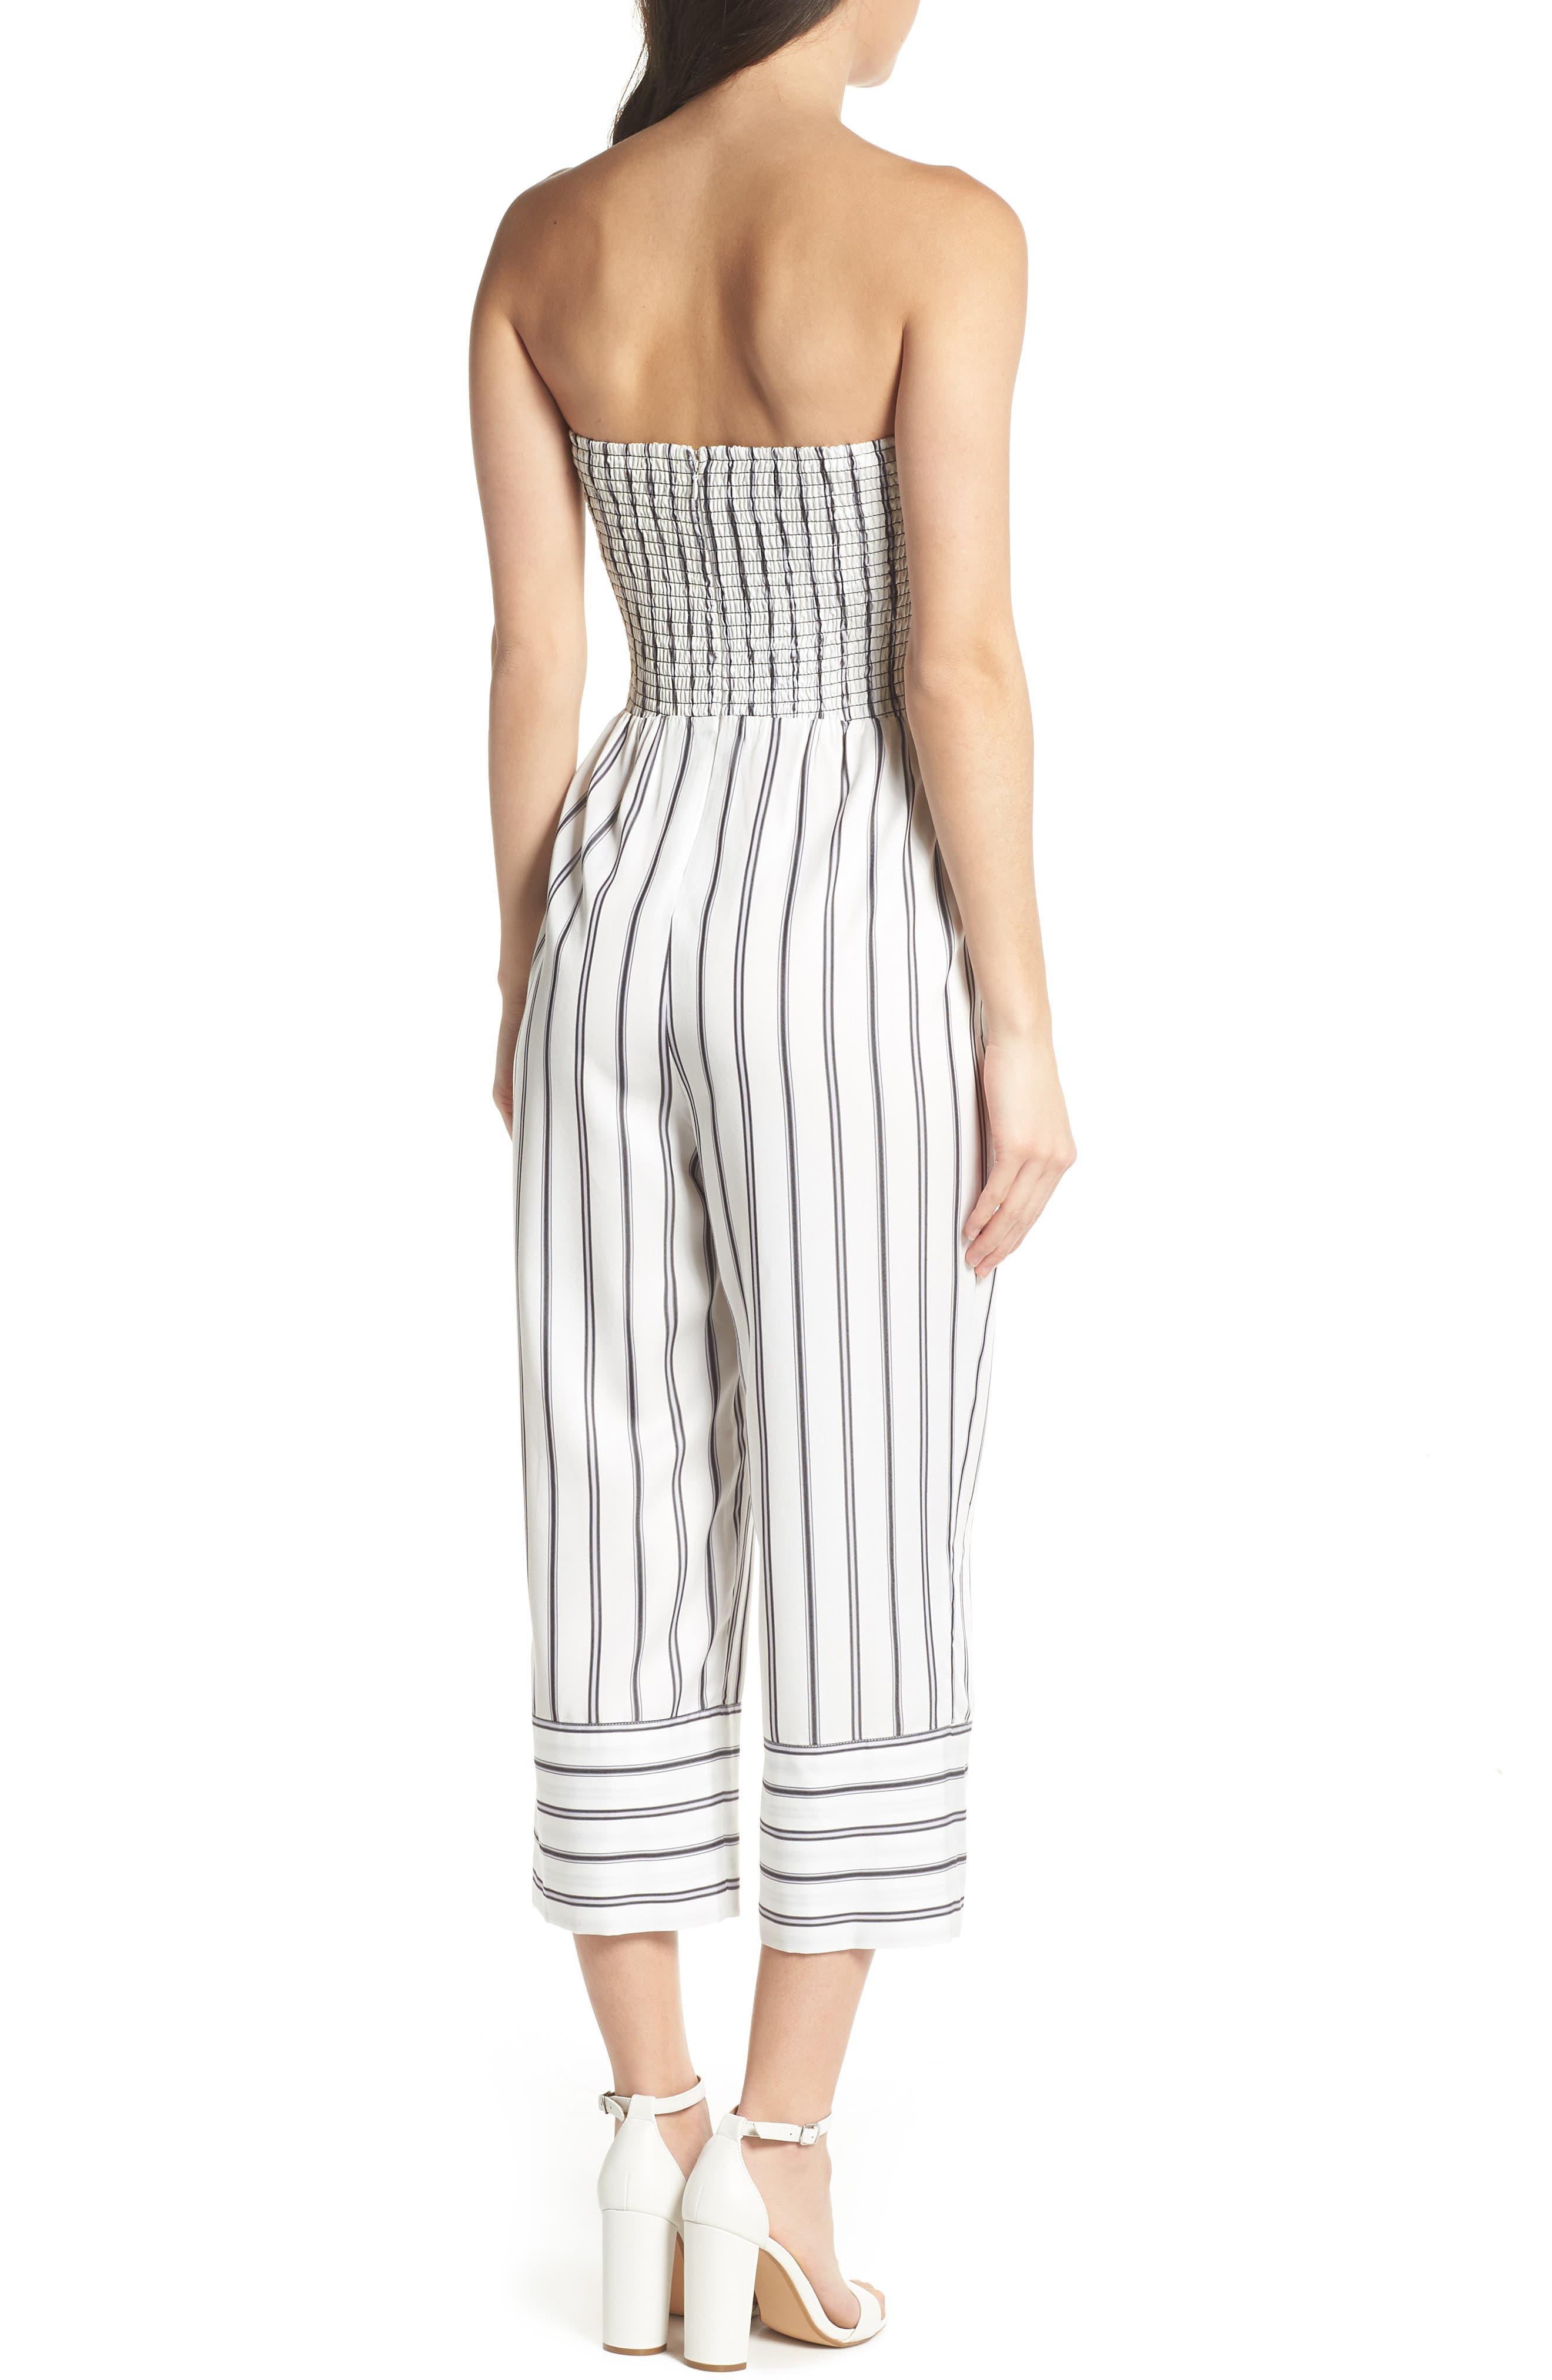 Get in the Grove Stripe Strapless Jumpsuit,                             Alternate thumbnail 2, color,                             Black/ White Uneven Stripe